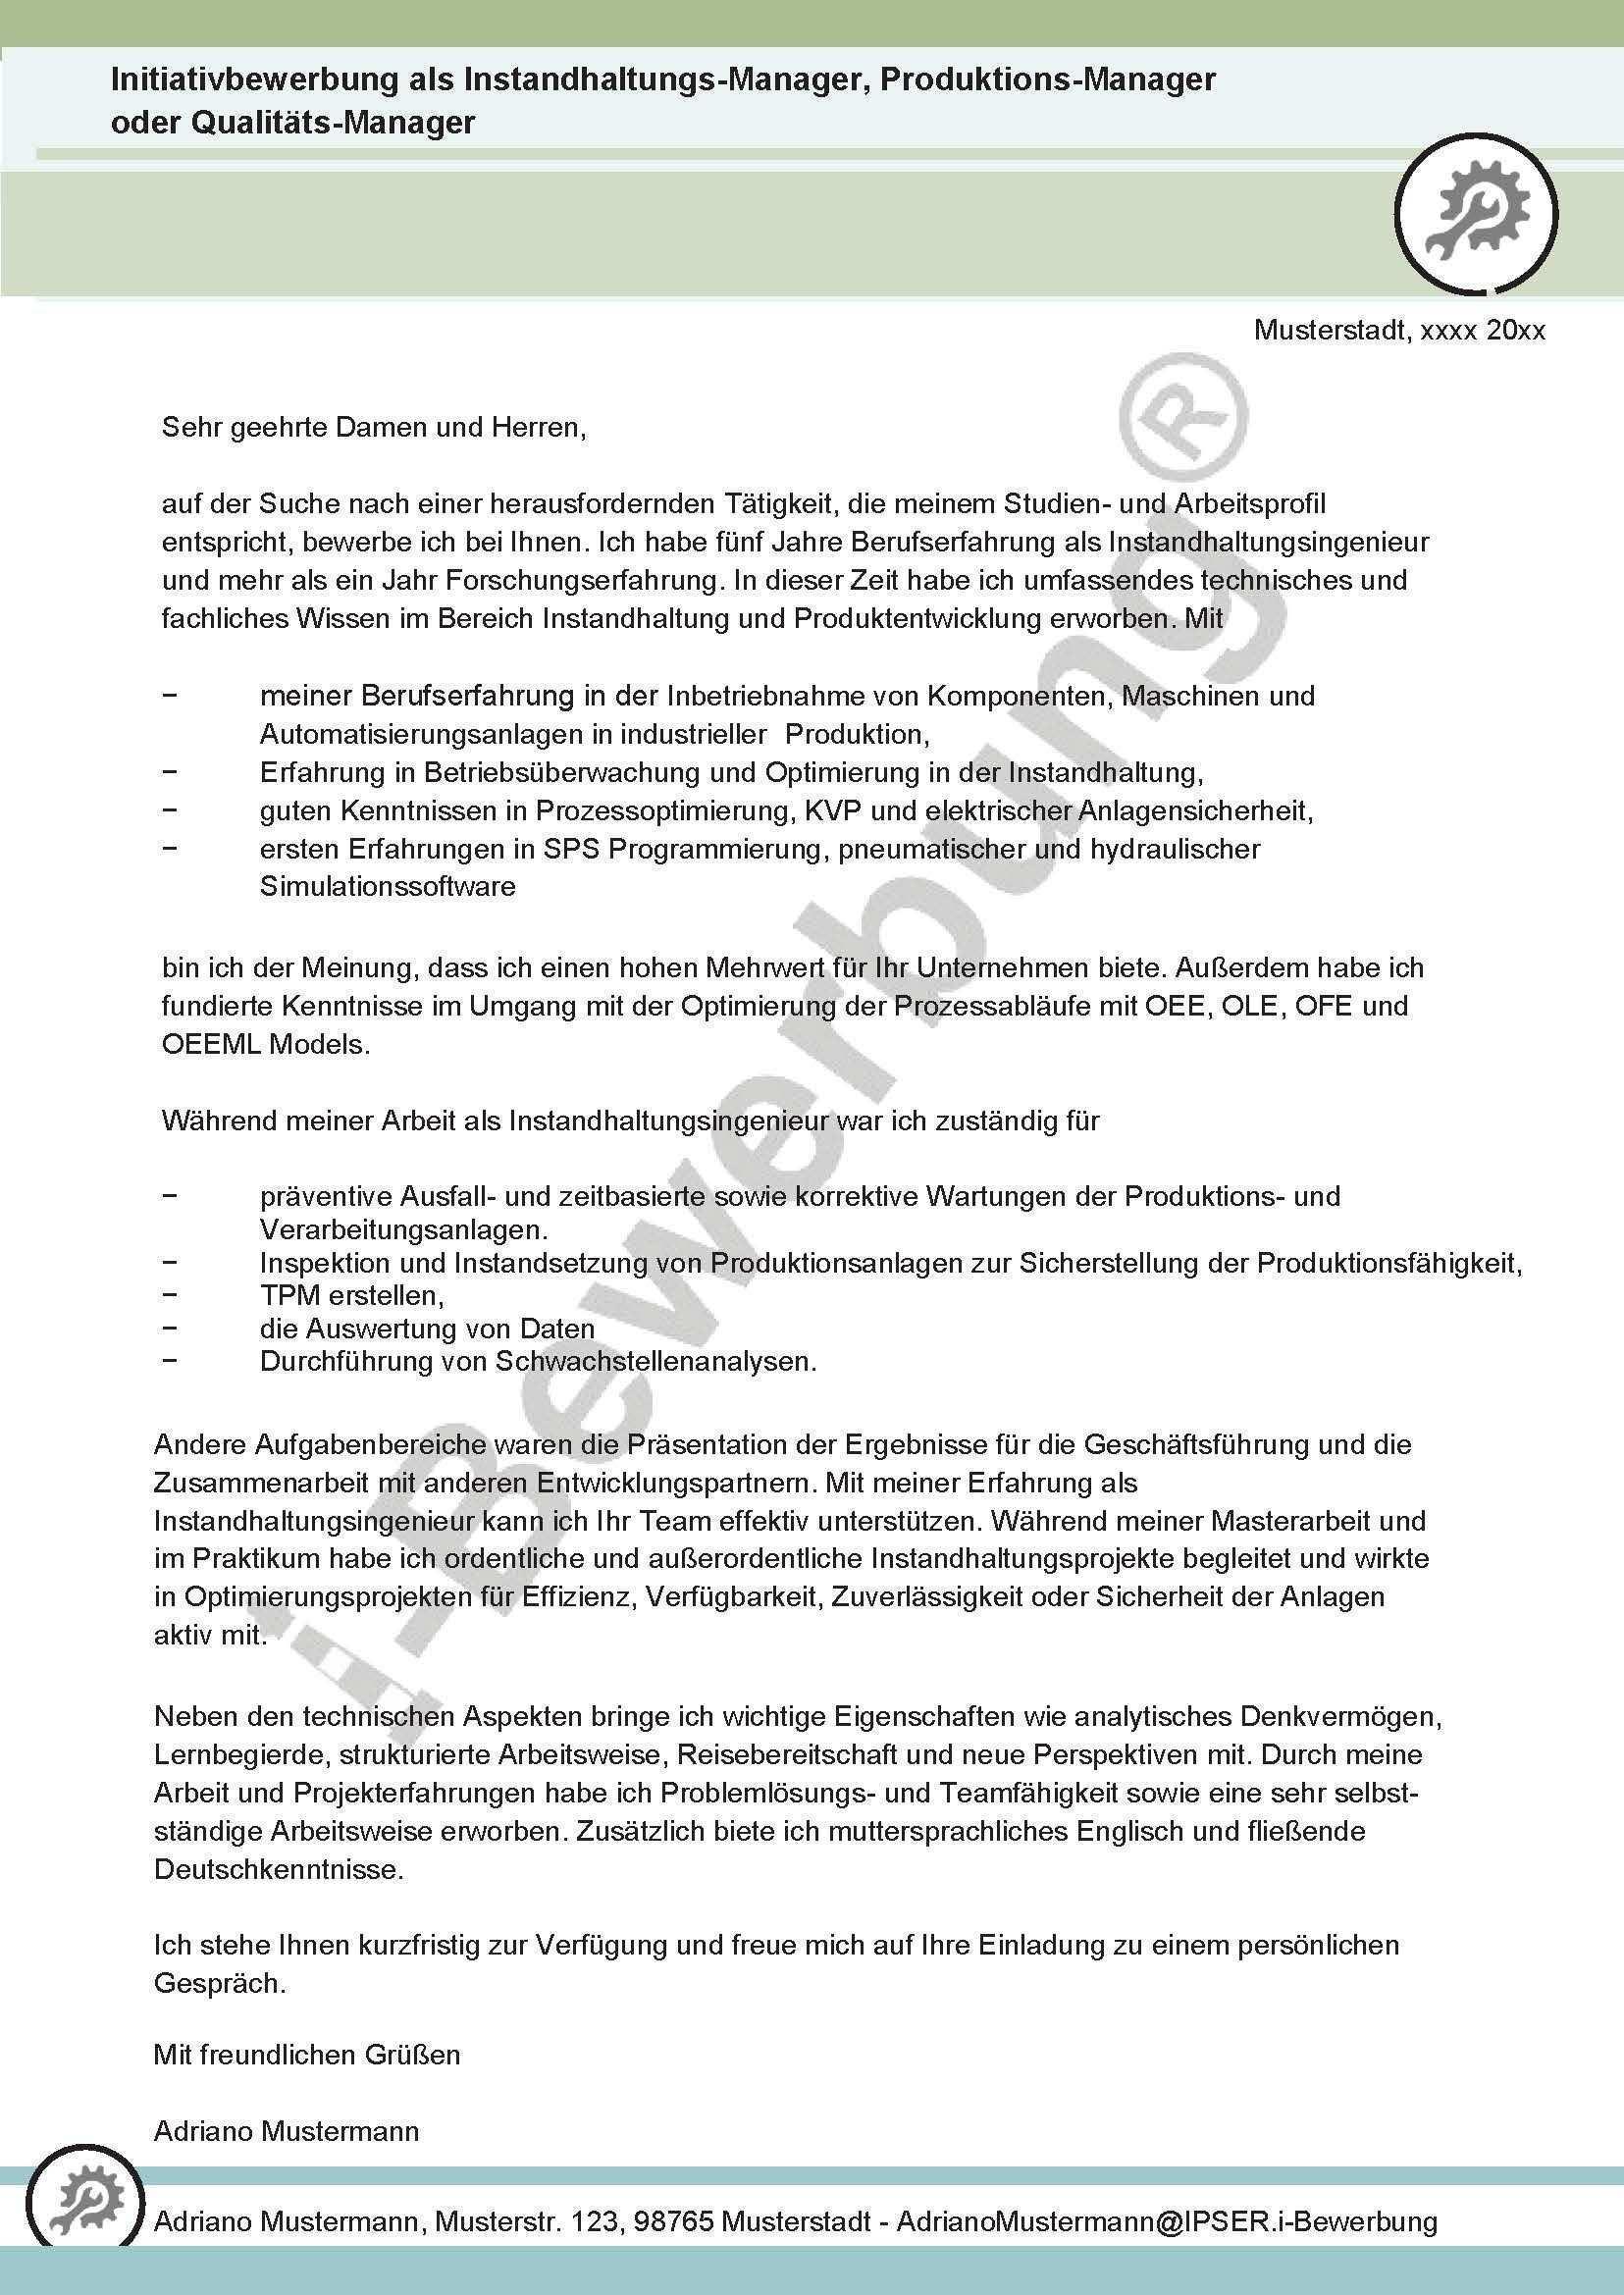 Initiativbewerbung Instandhaltungsmanager Anschreiben Adriano 631 Bewerbung Schreiben Anschreiben Bewerbung